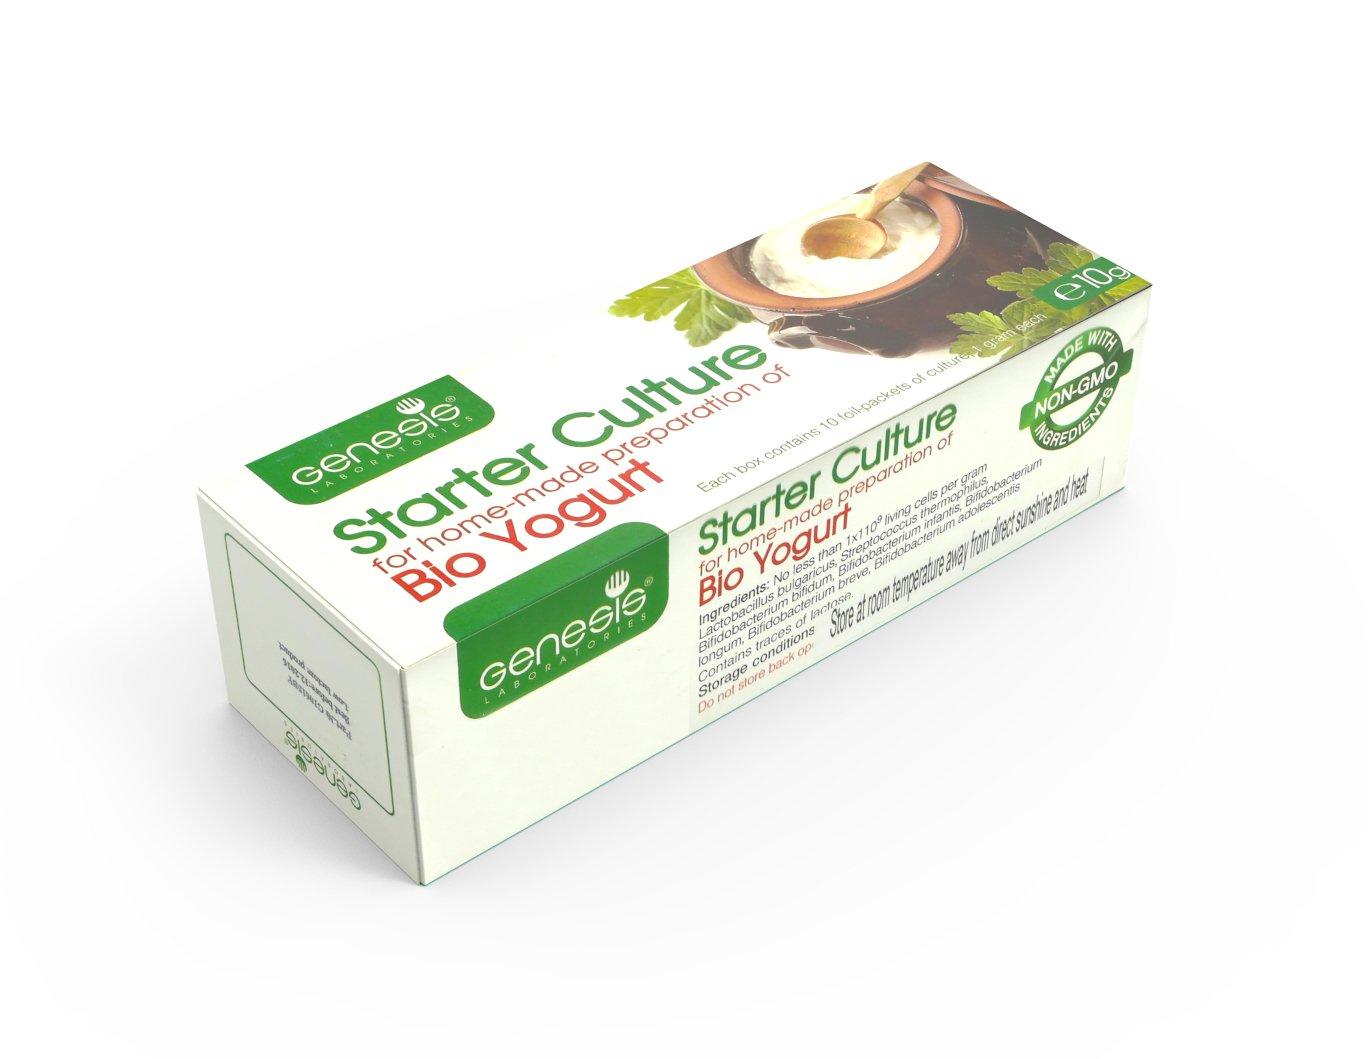 Bulgarian Bio Yogurt Starter Culture - natural, home made - up to 50 liters